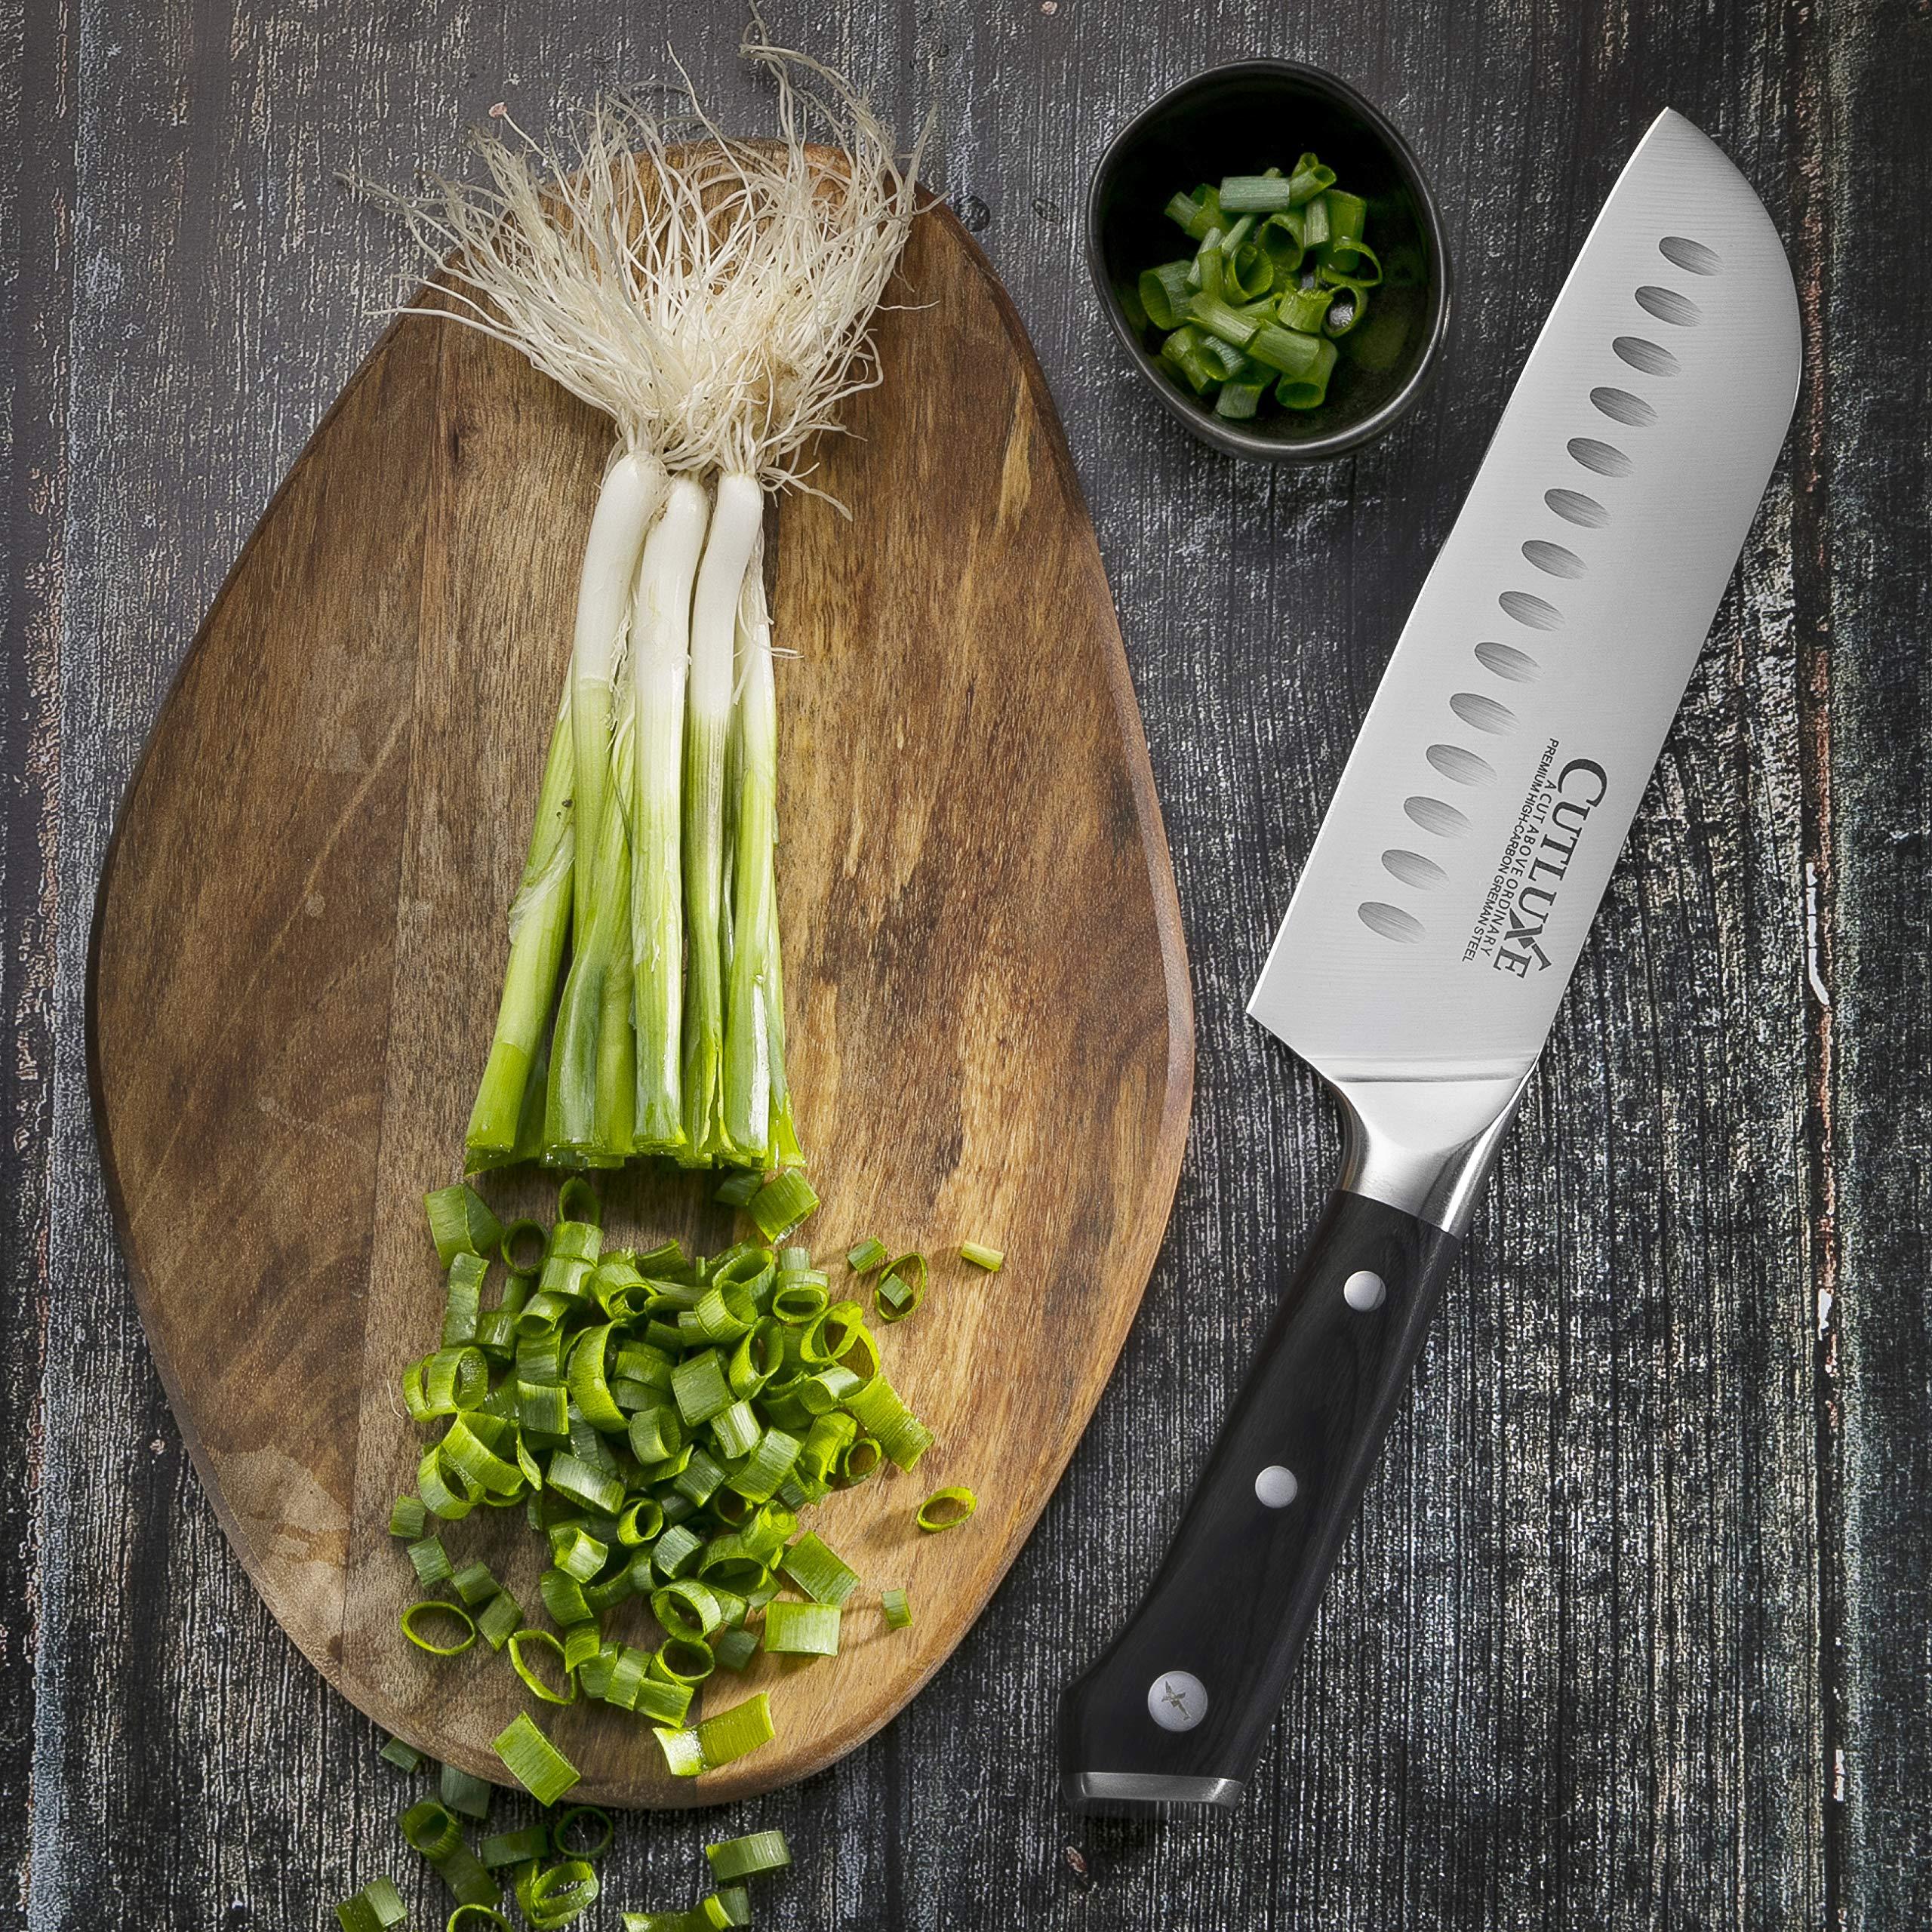 Cutluxe Santoku Knife - 7 Inch Kitchen Knife Forged of High Carbon German Steel - Ergonomic Pakkawood Handle - Full Tang Razor Sharp Blade by Cutluxe (Image #6)